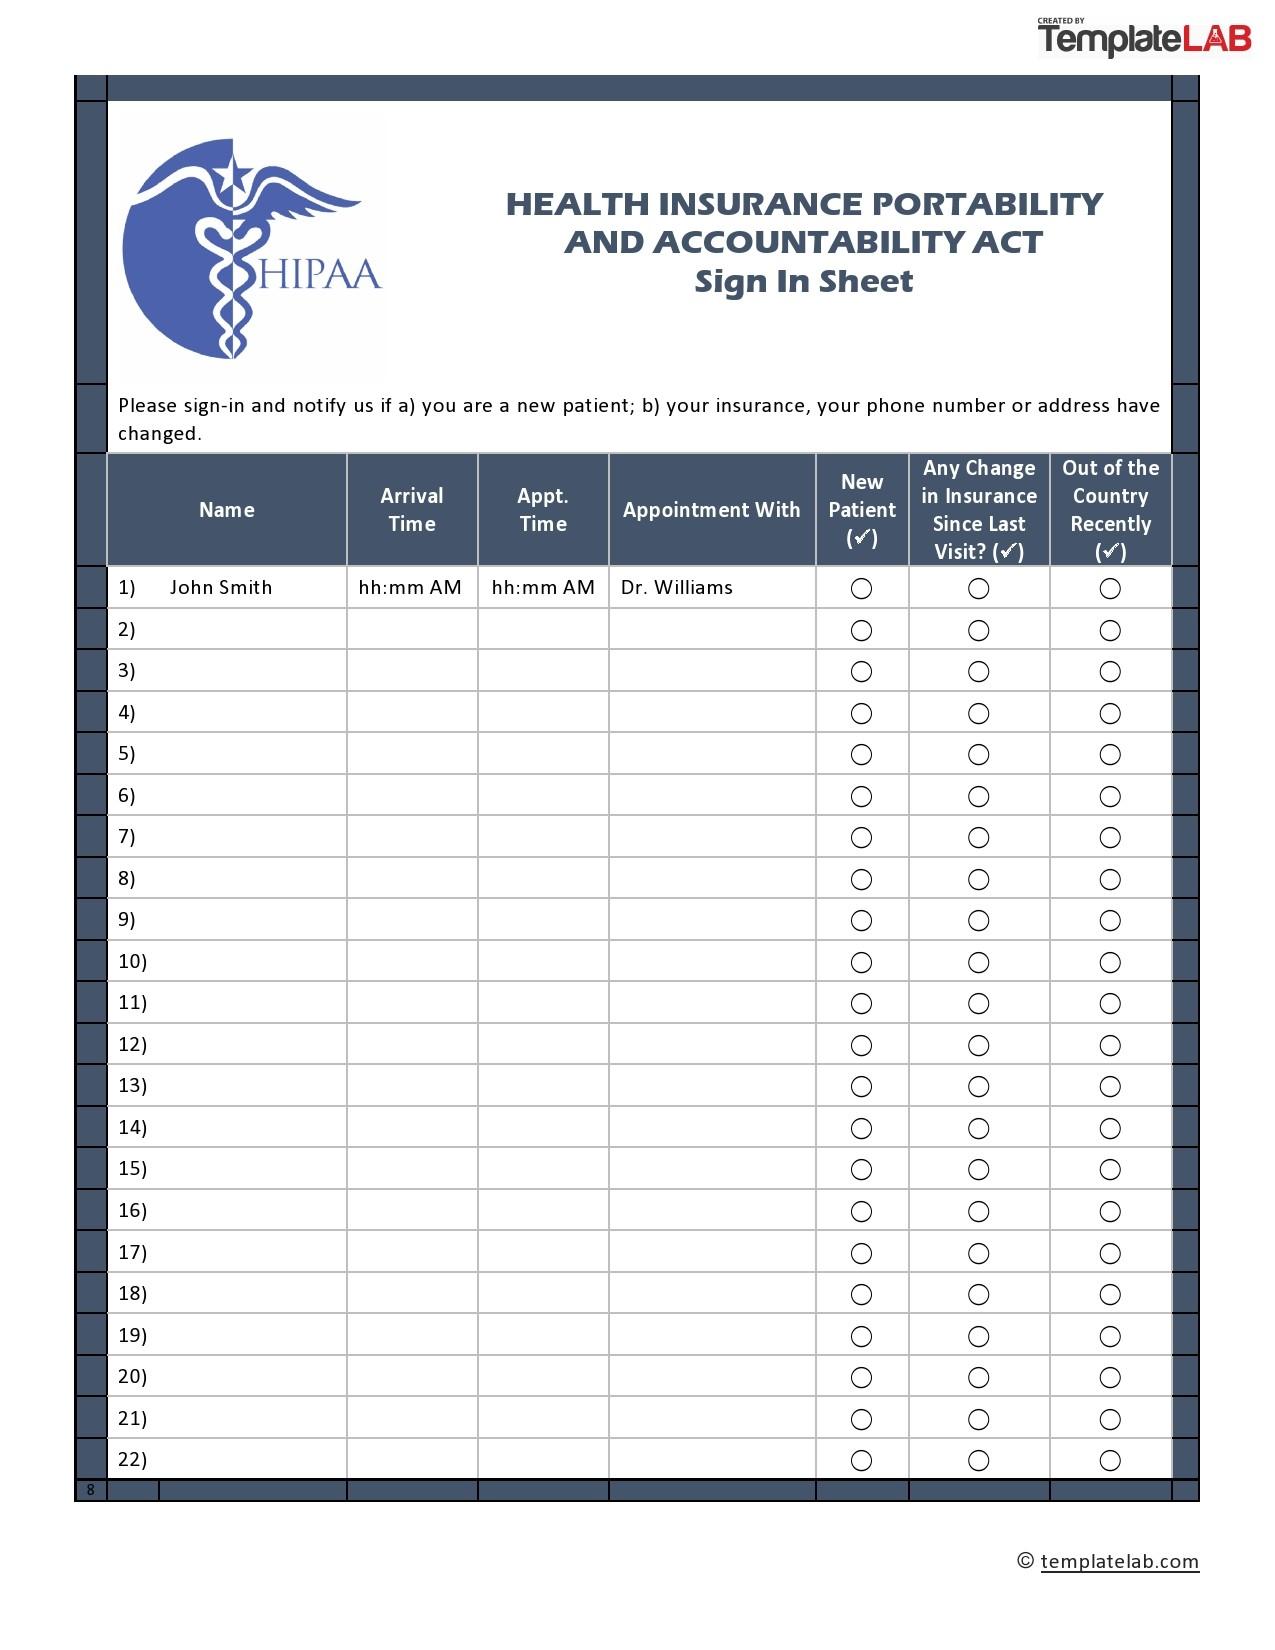 Free HIPAA Sign In Sheet